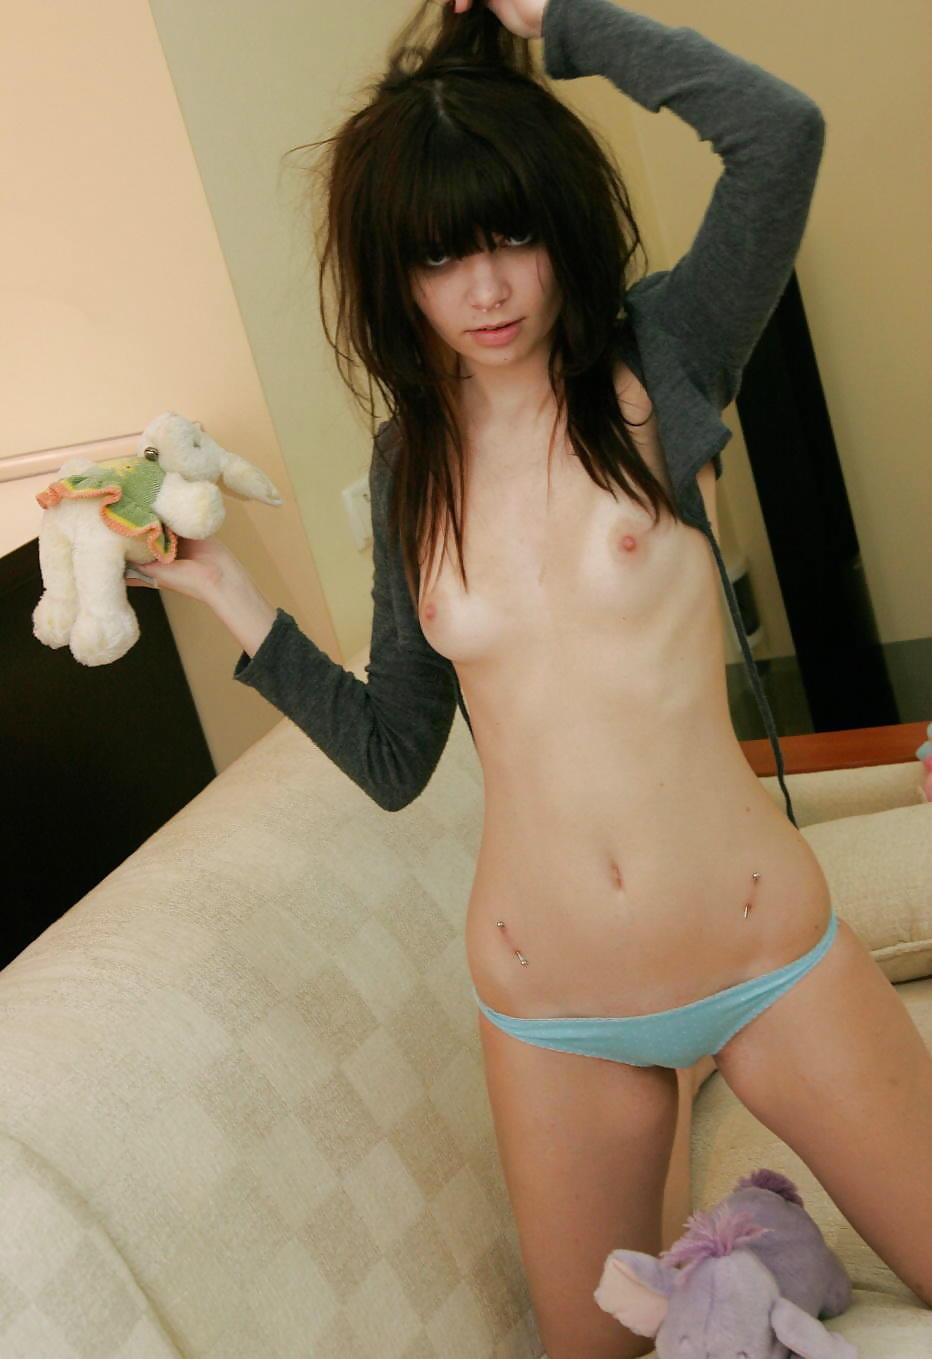 Cute Emo Girl Pic